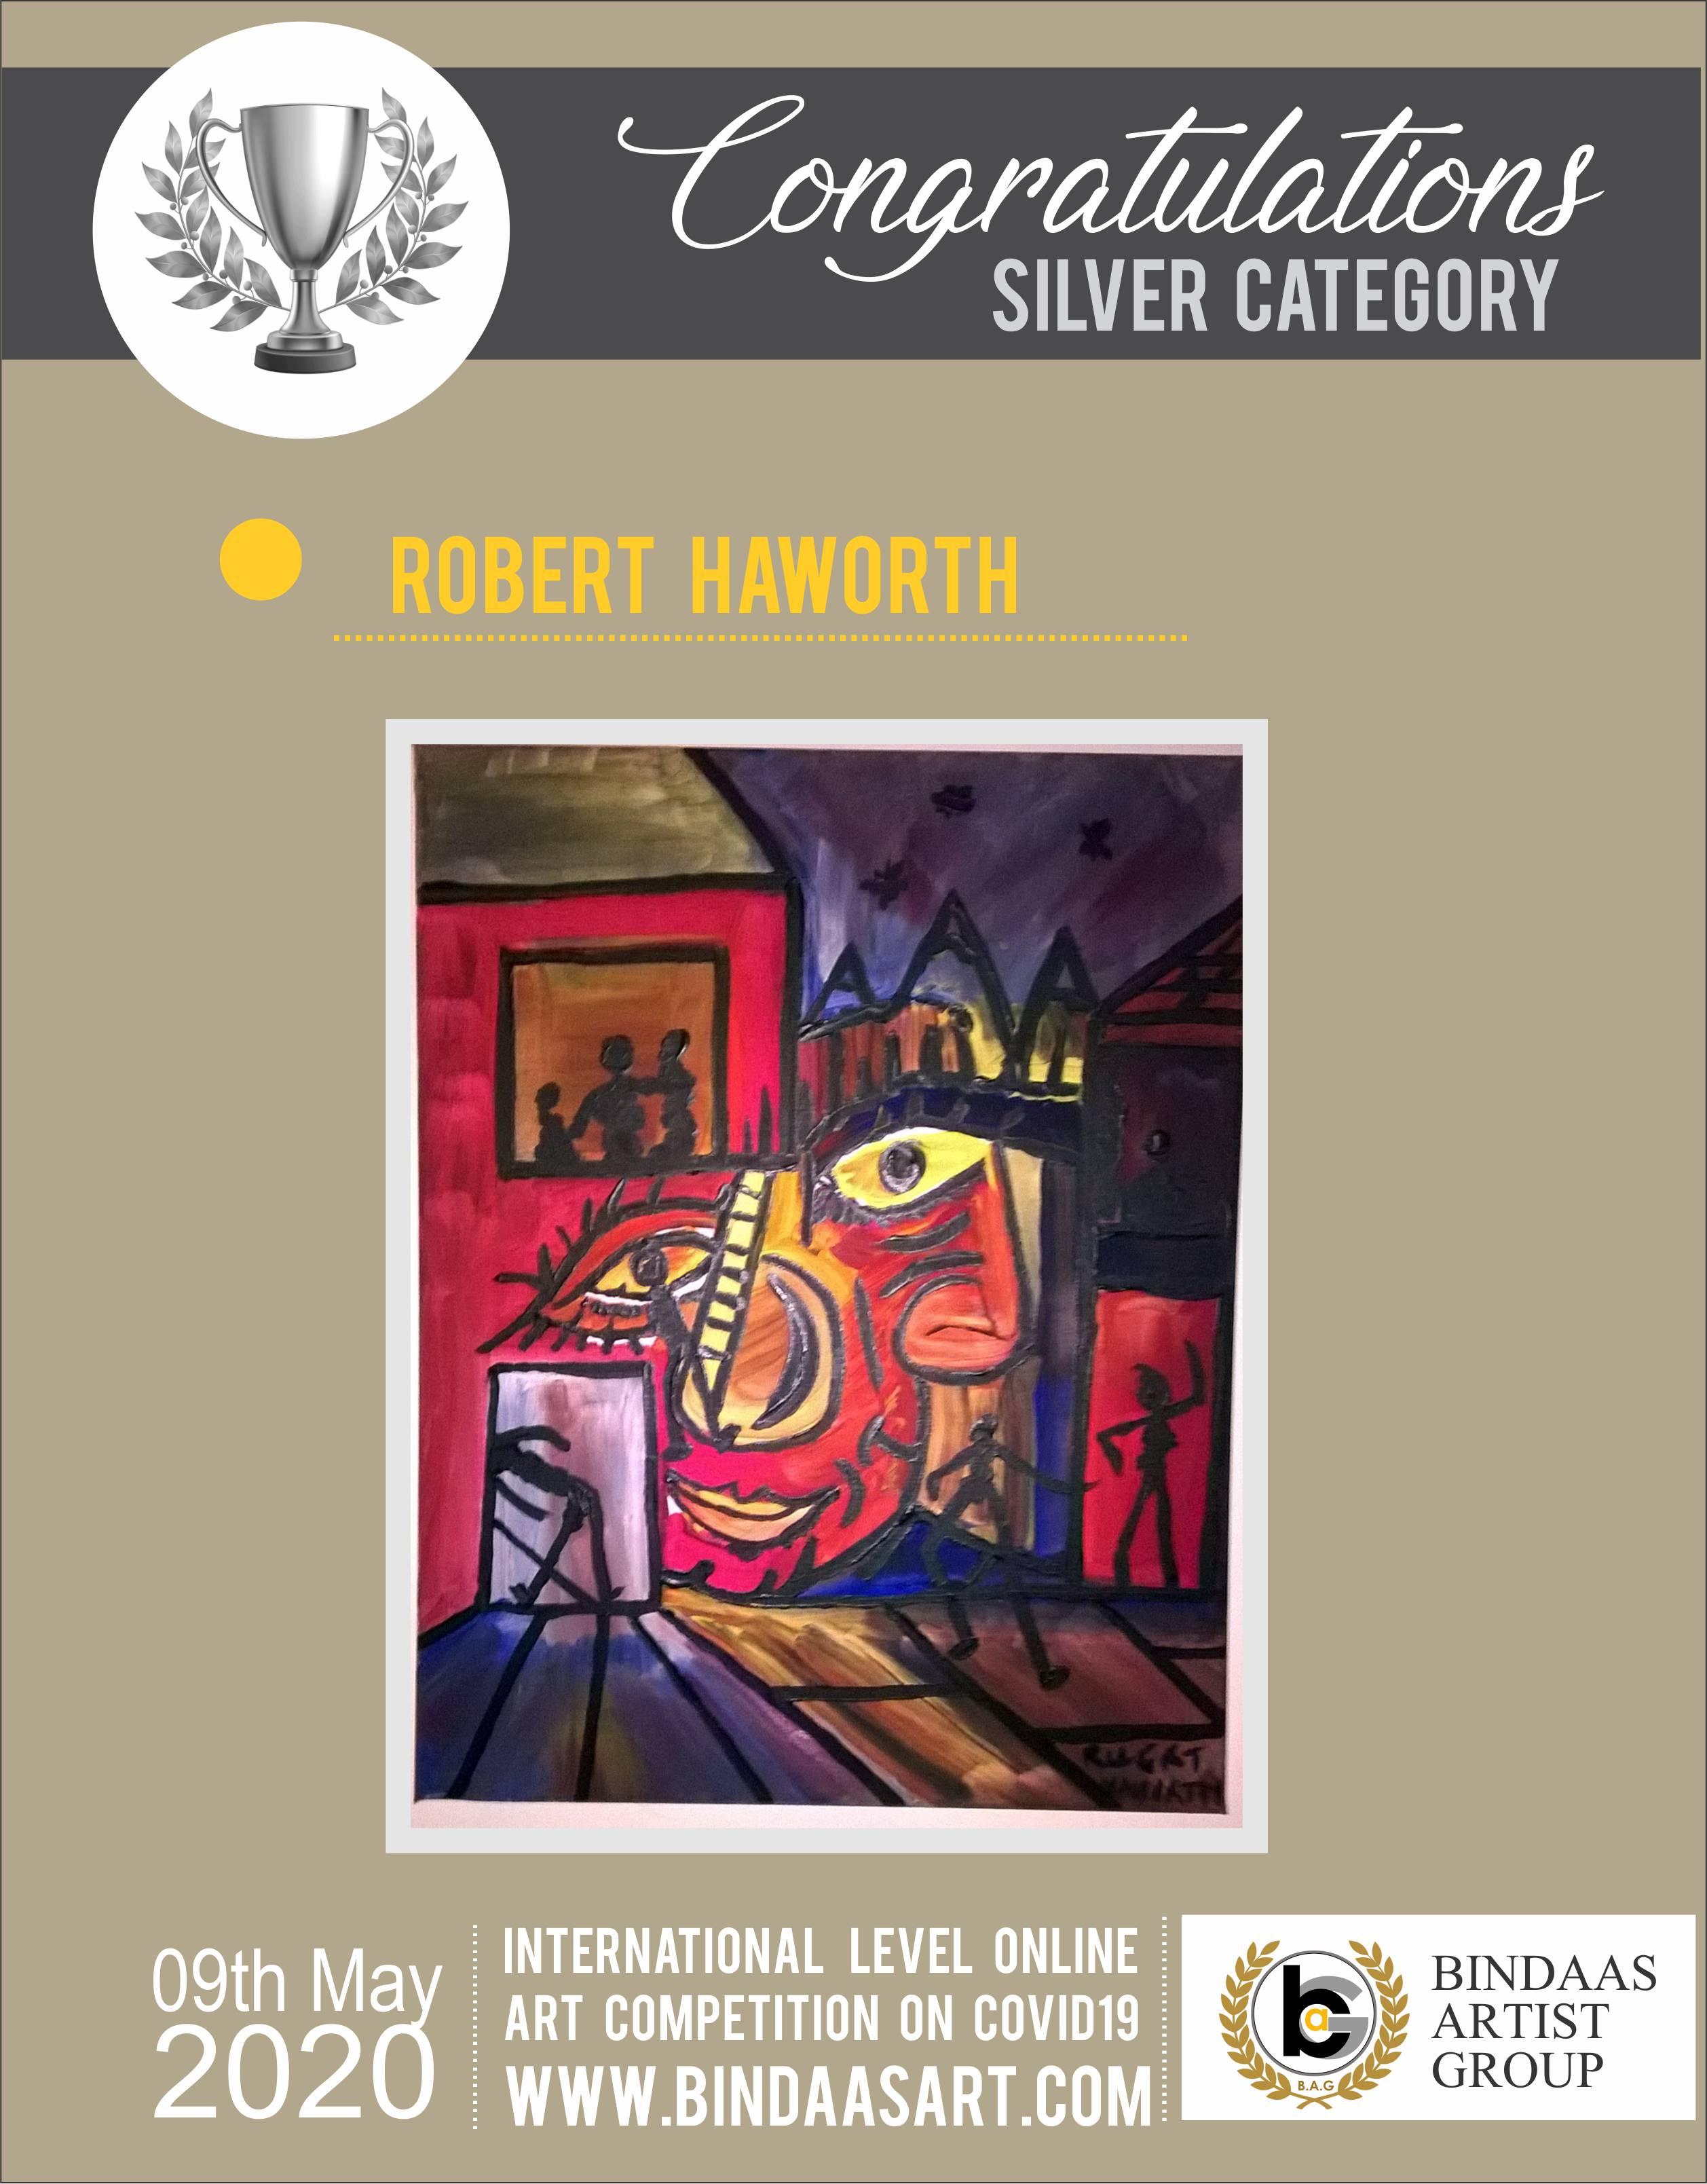 Robert Haworth